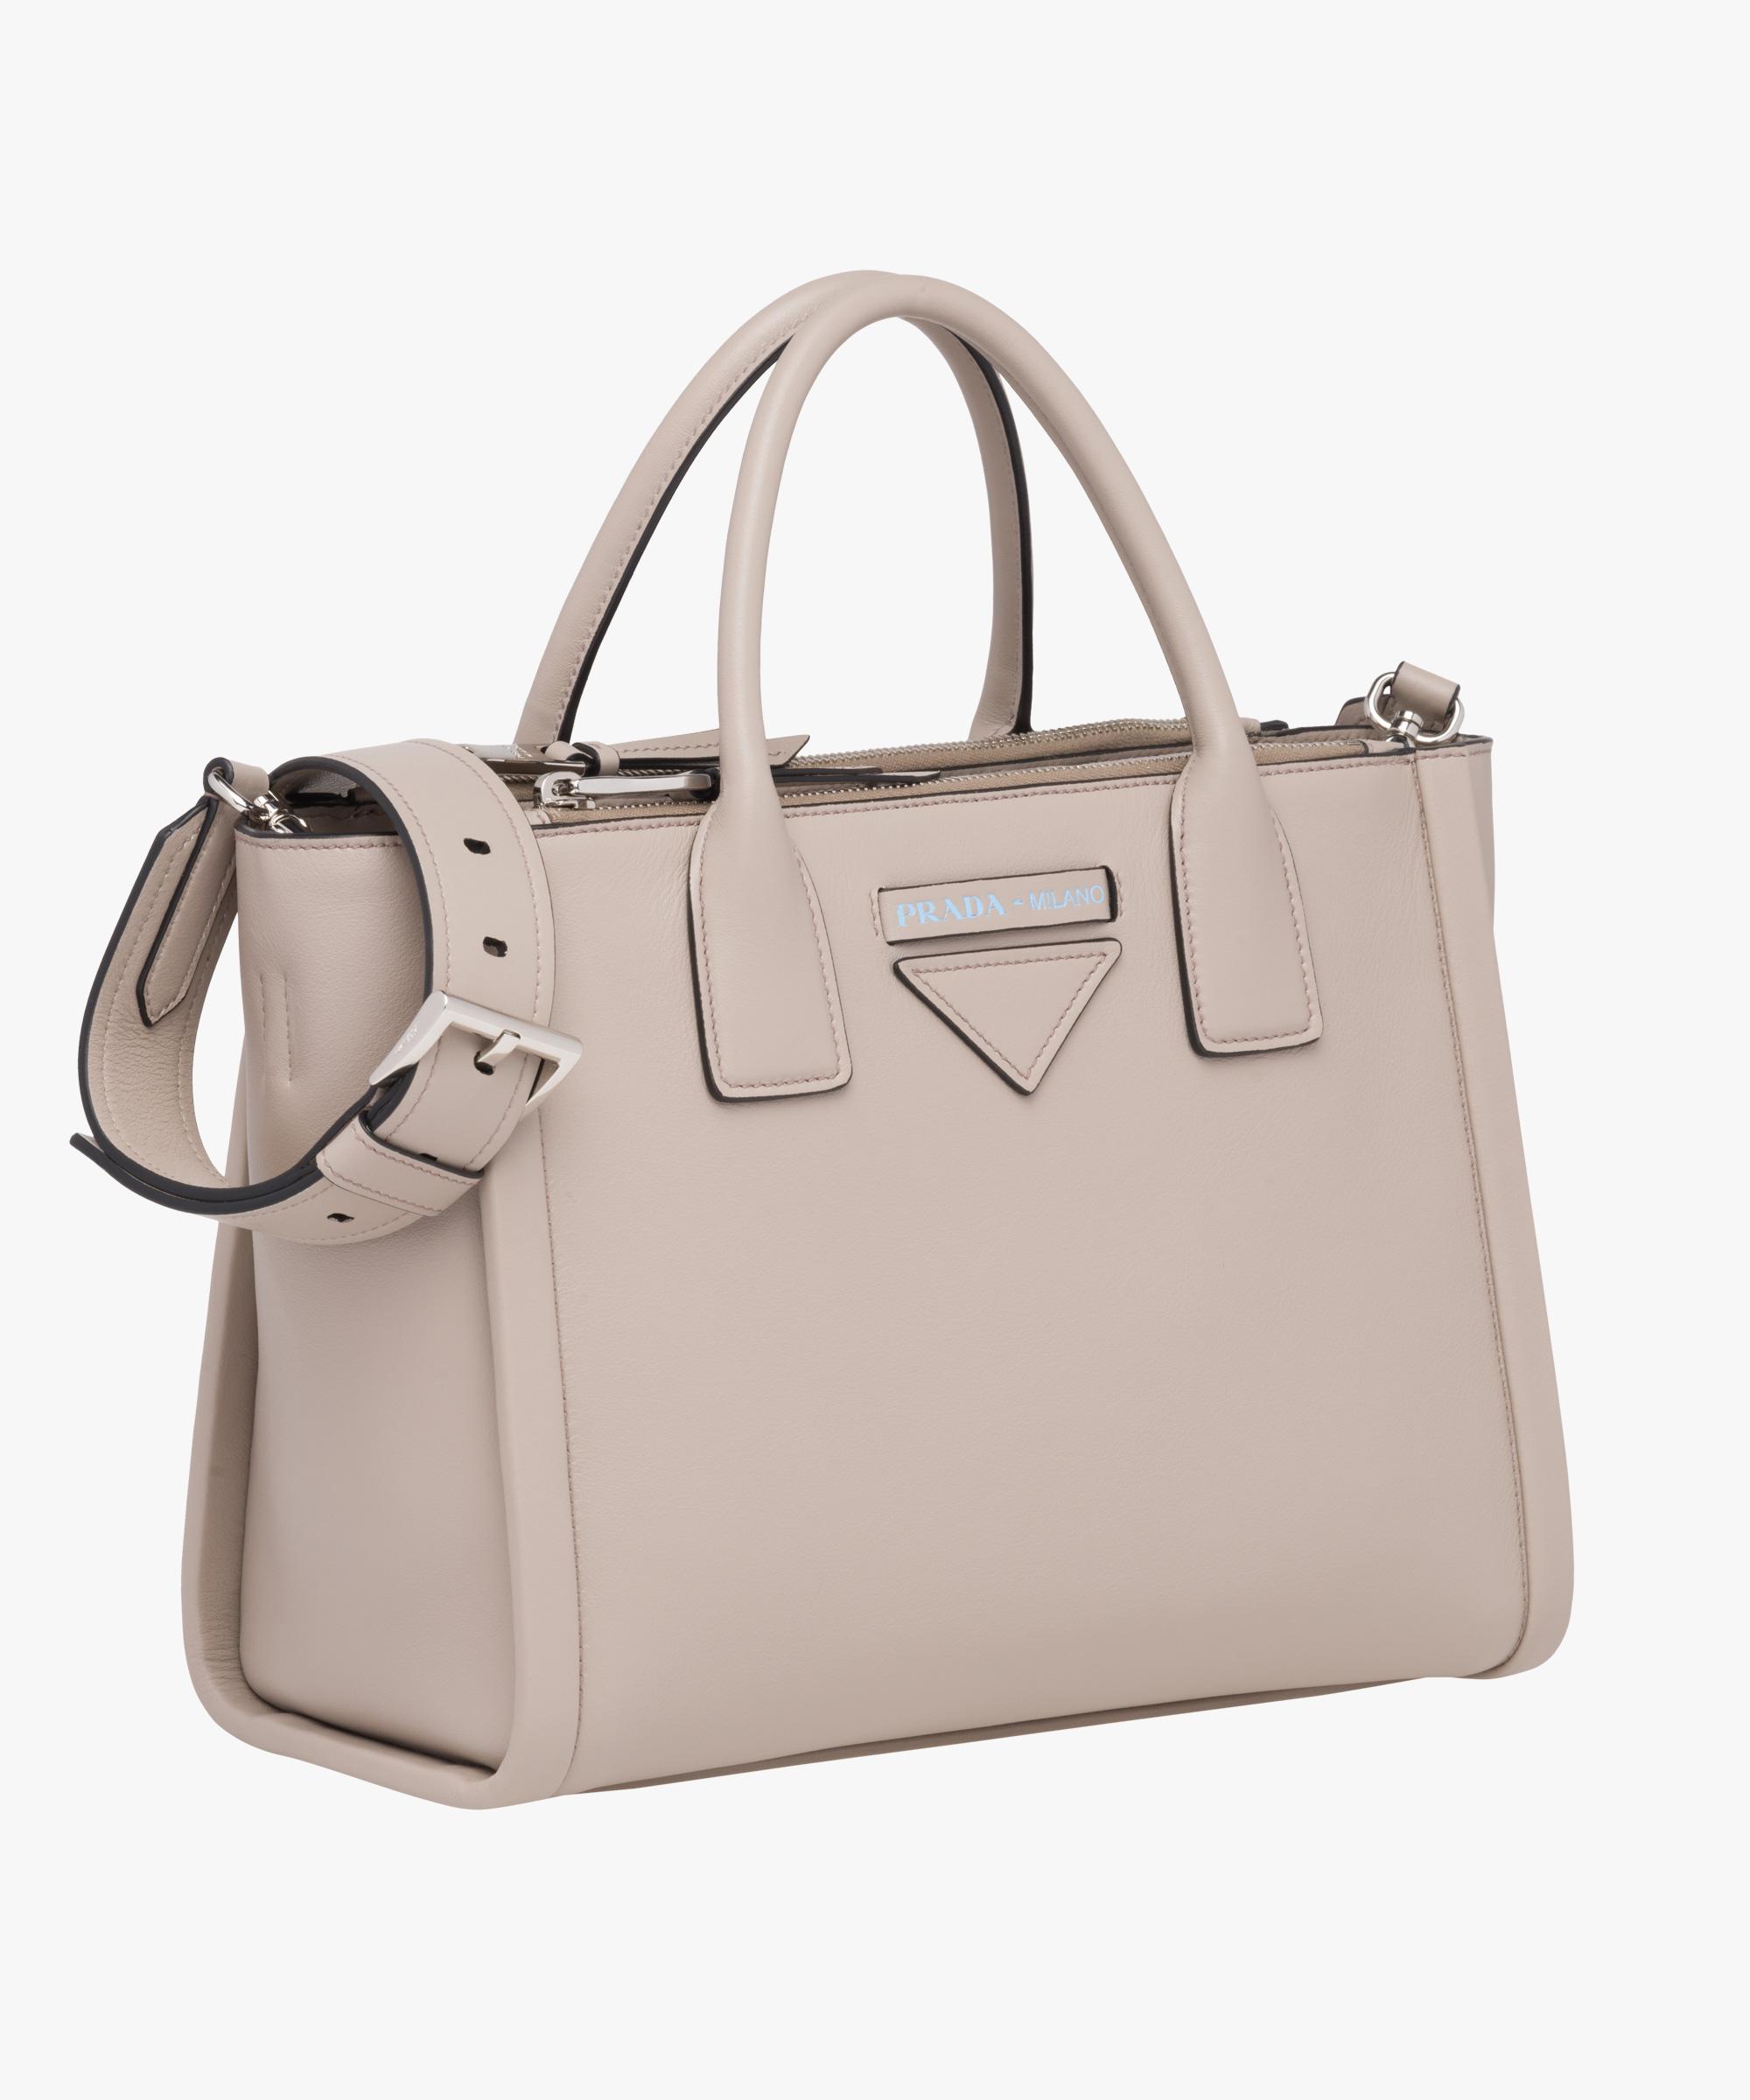 33749f676813eb Prada Concept calf leather bag Prada PUMICE STONE .